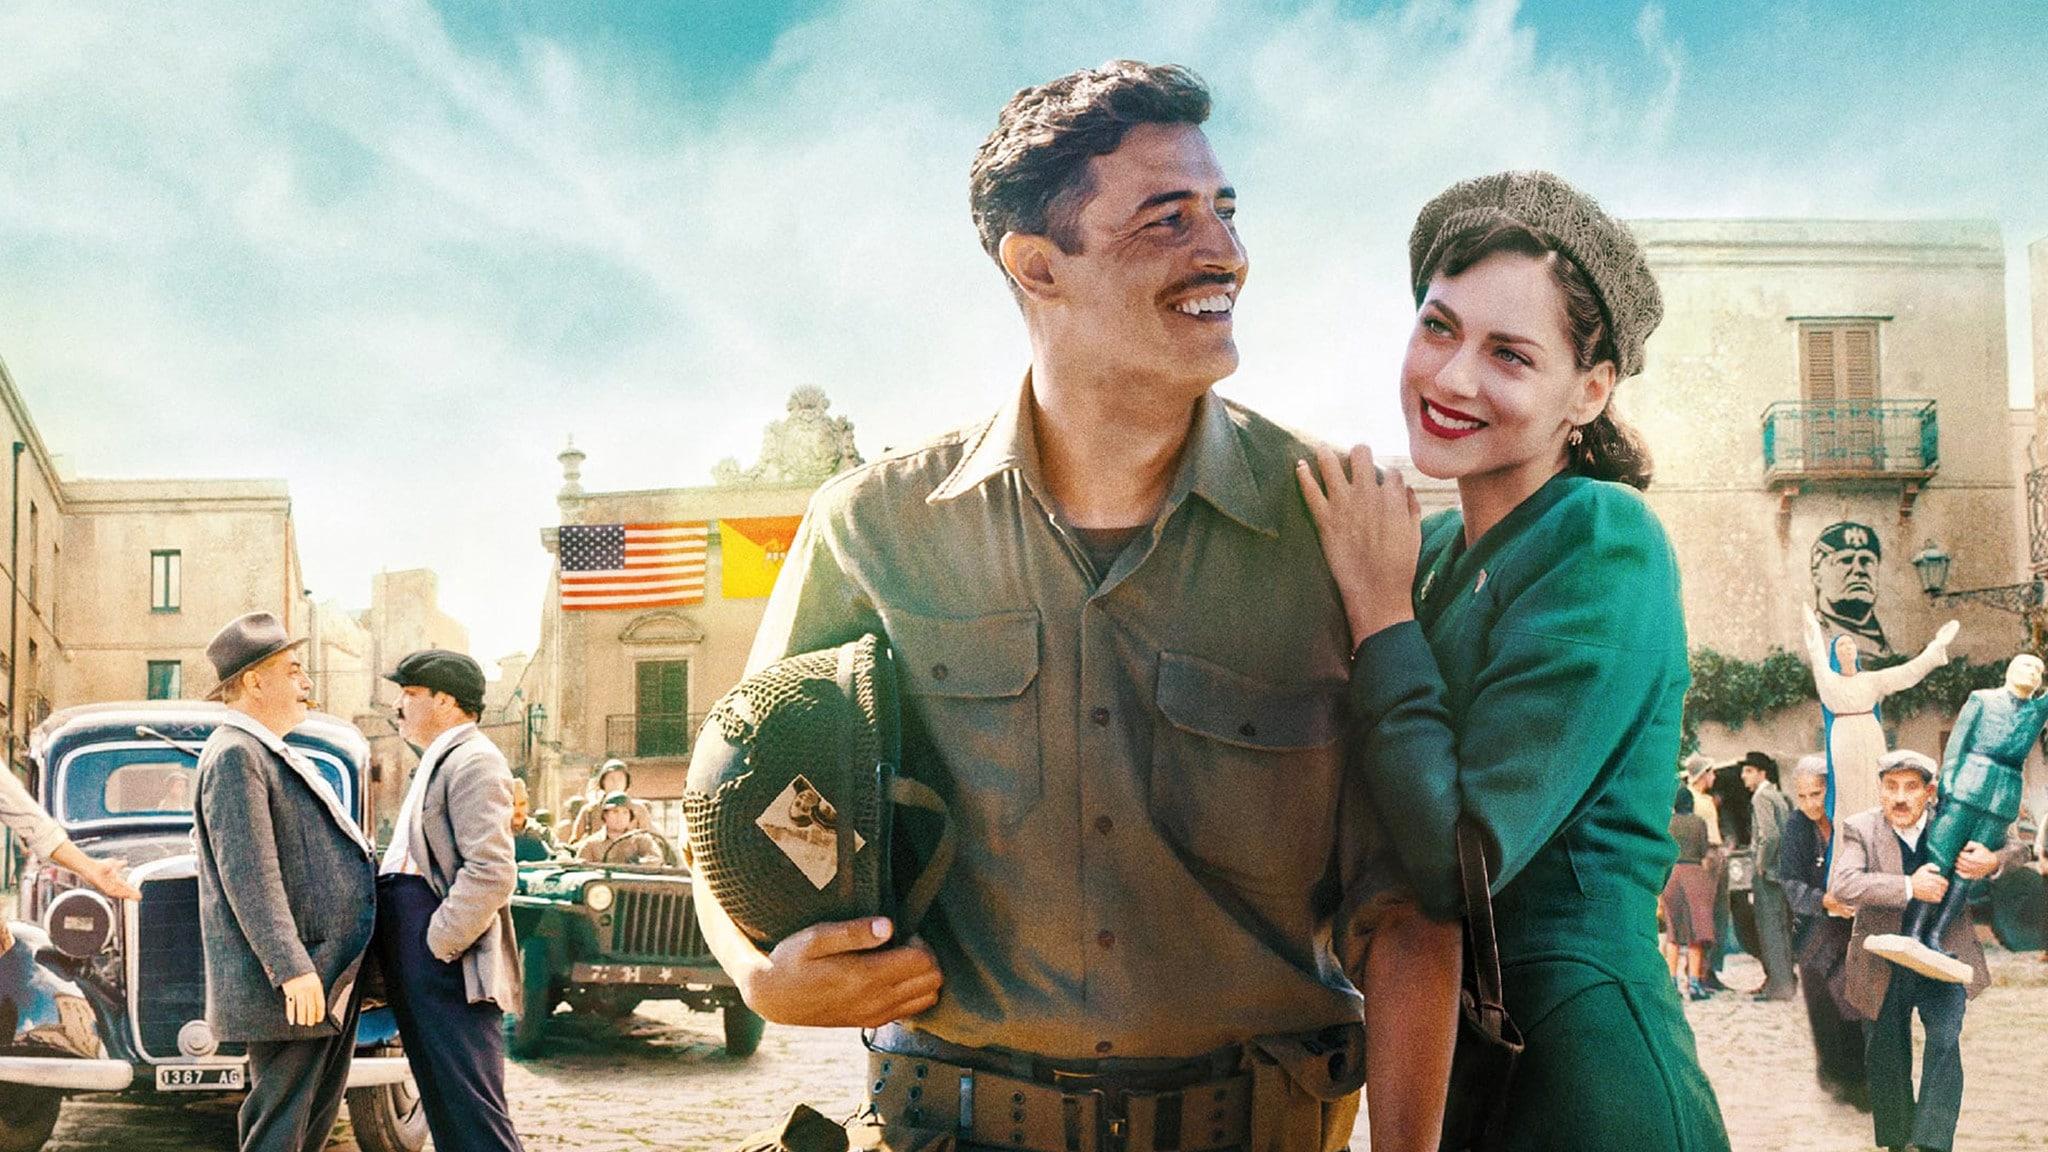 Rai Movie In guerra per amore